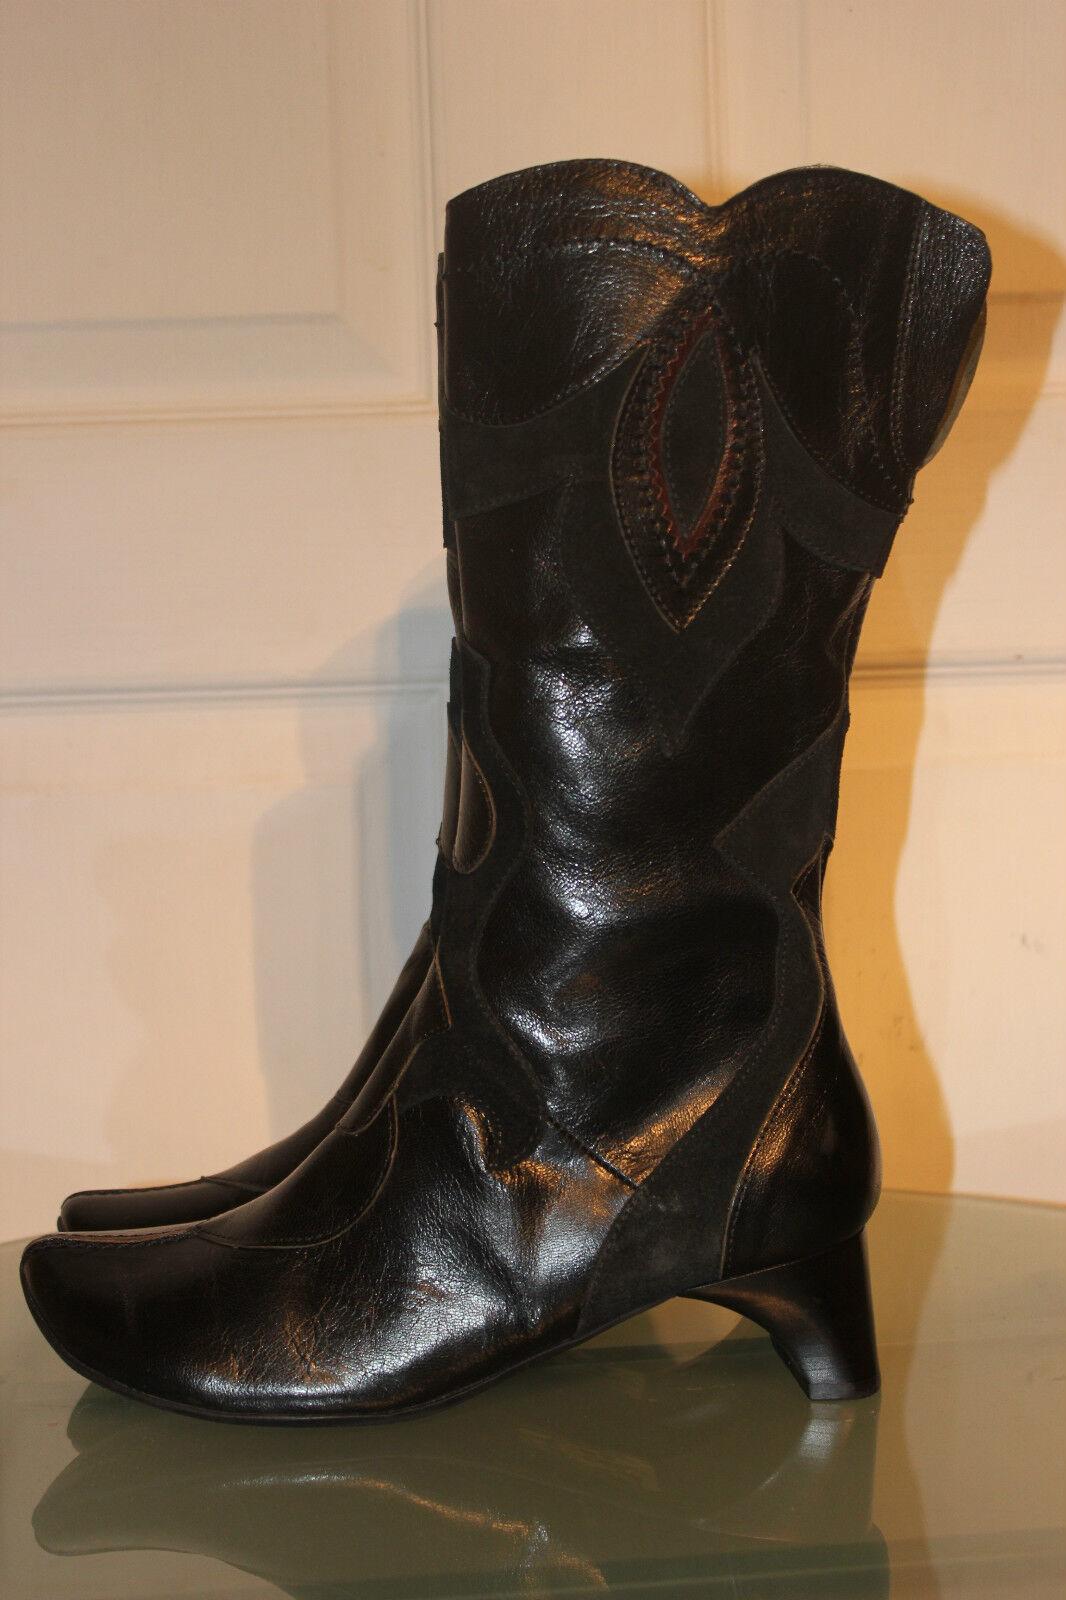 in vendita Think SUPER Bel Nero Echt Leder stivali, stivali, stivali, Tg. 37, 2x indossato   confortevole